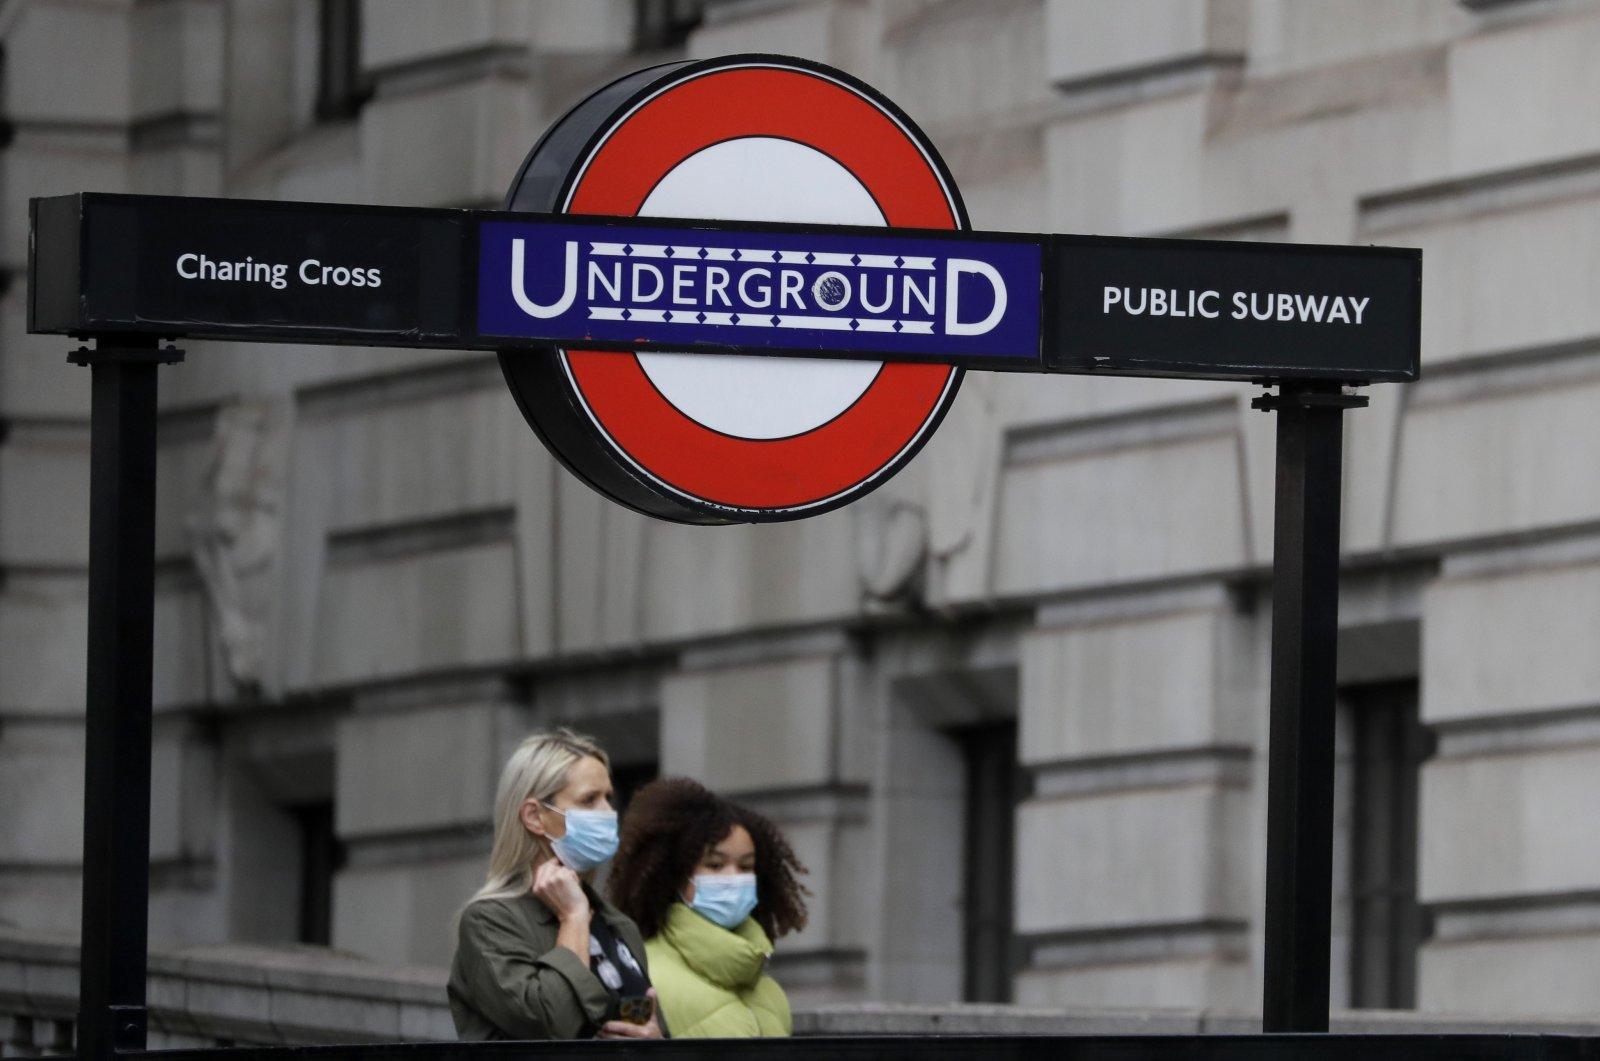 Pedestrians wear masks as they walk near a subway station in London, U.K., June 5, 2020. (AP Photo)